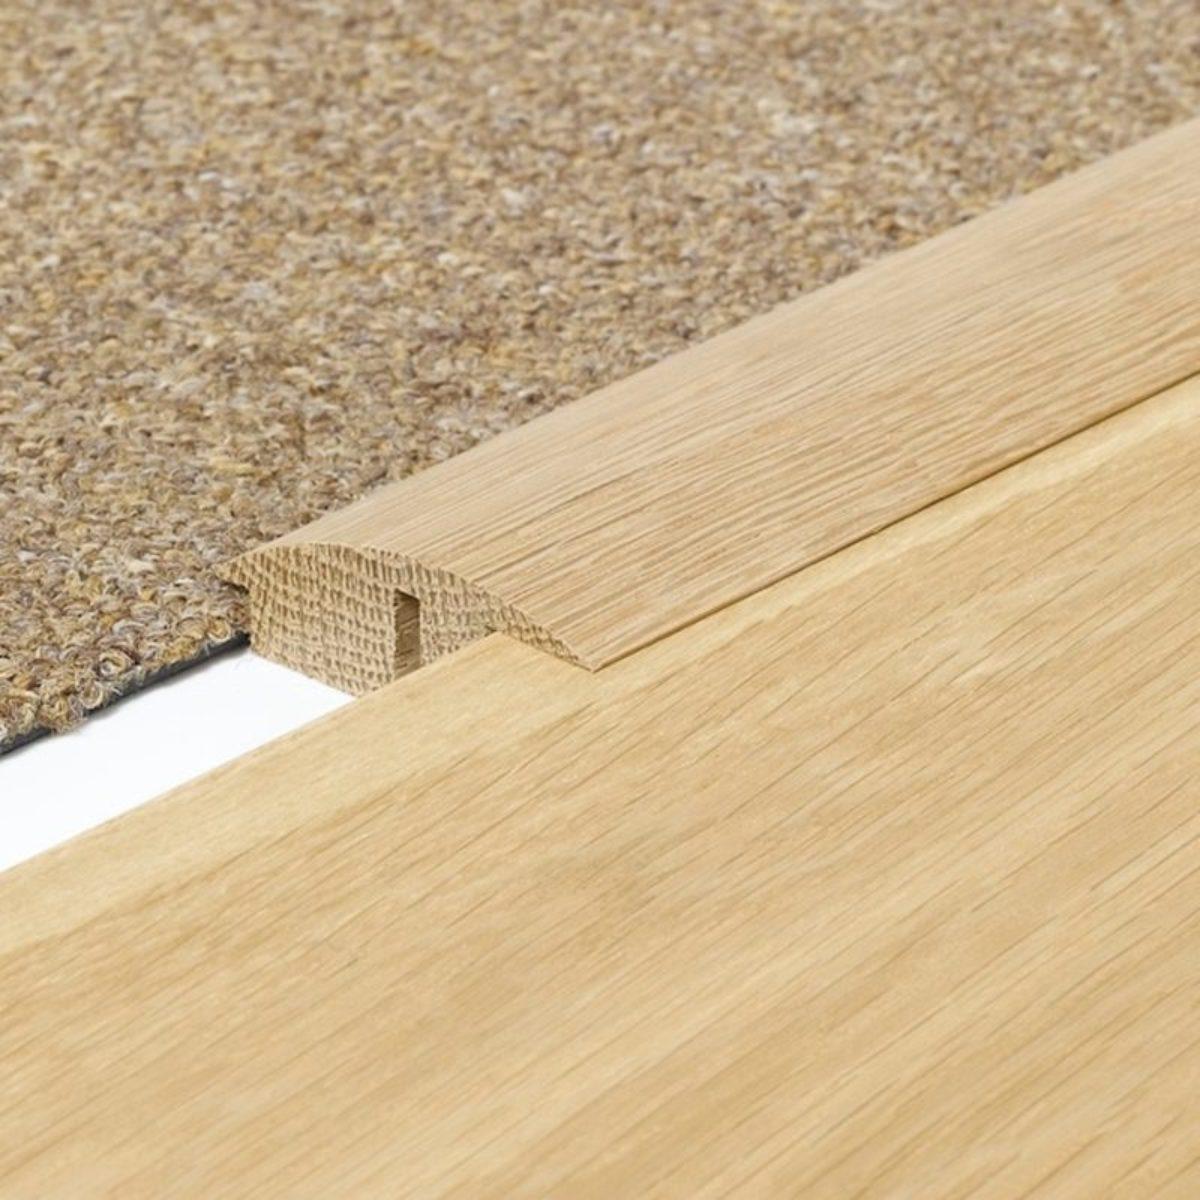 Solid Oak Semi Ramp Threshold Door, Laminate Flooring To Carpet Threshold Strips